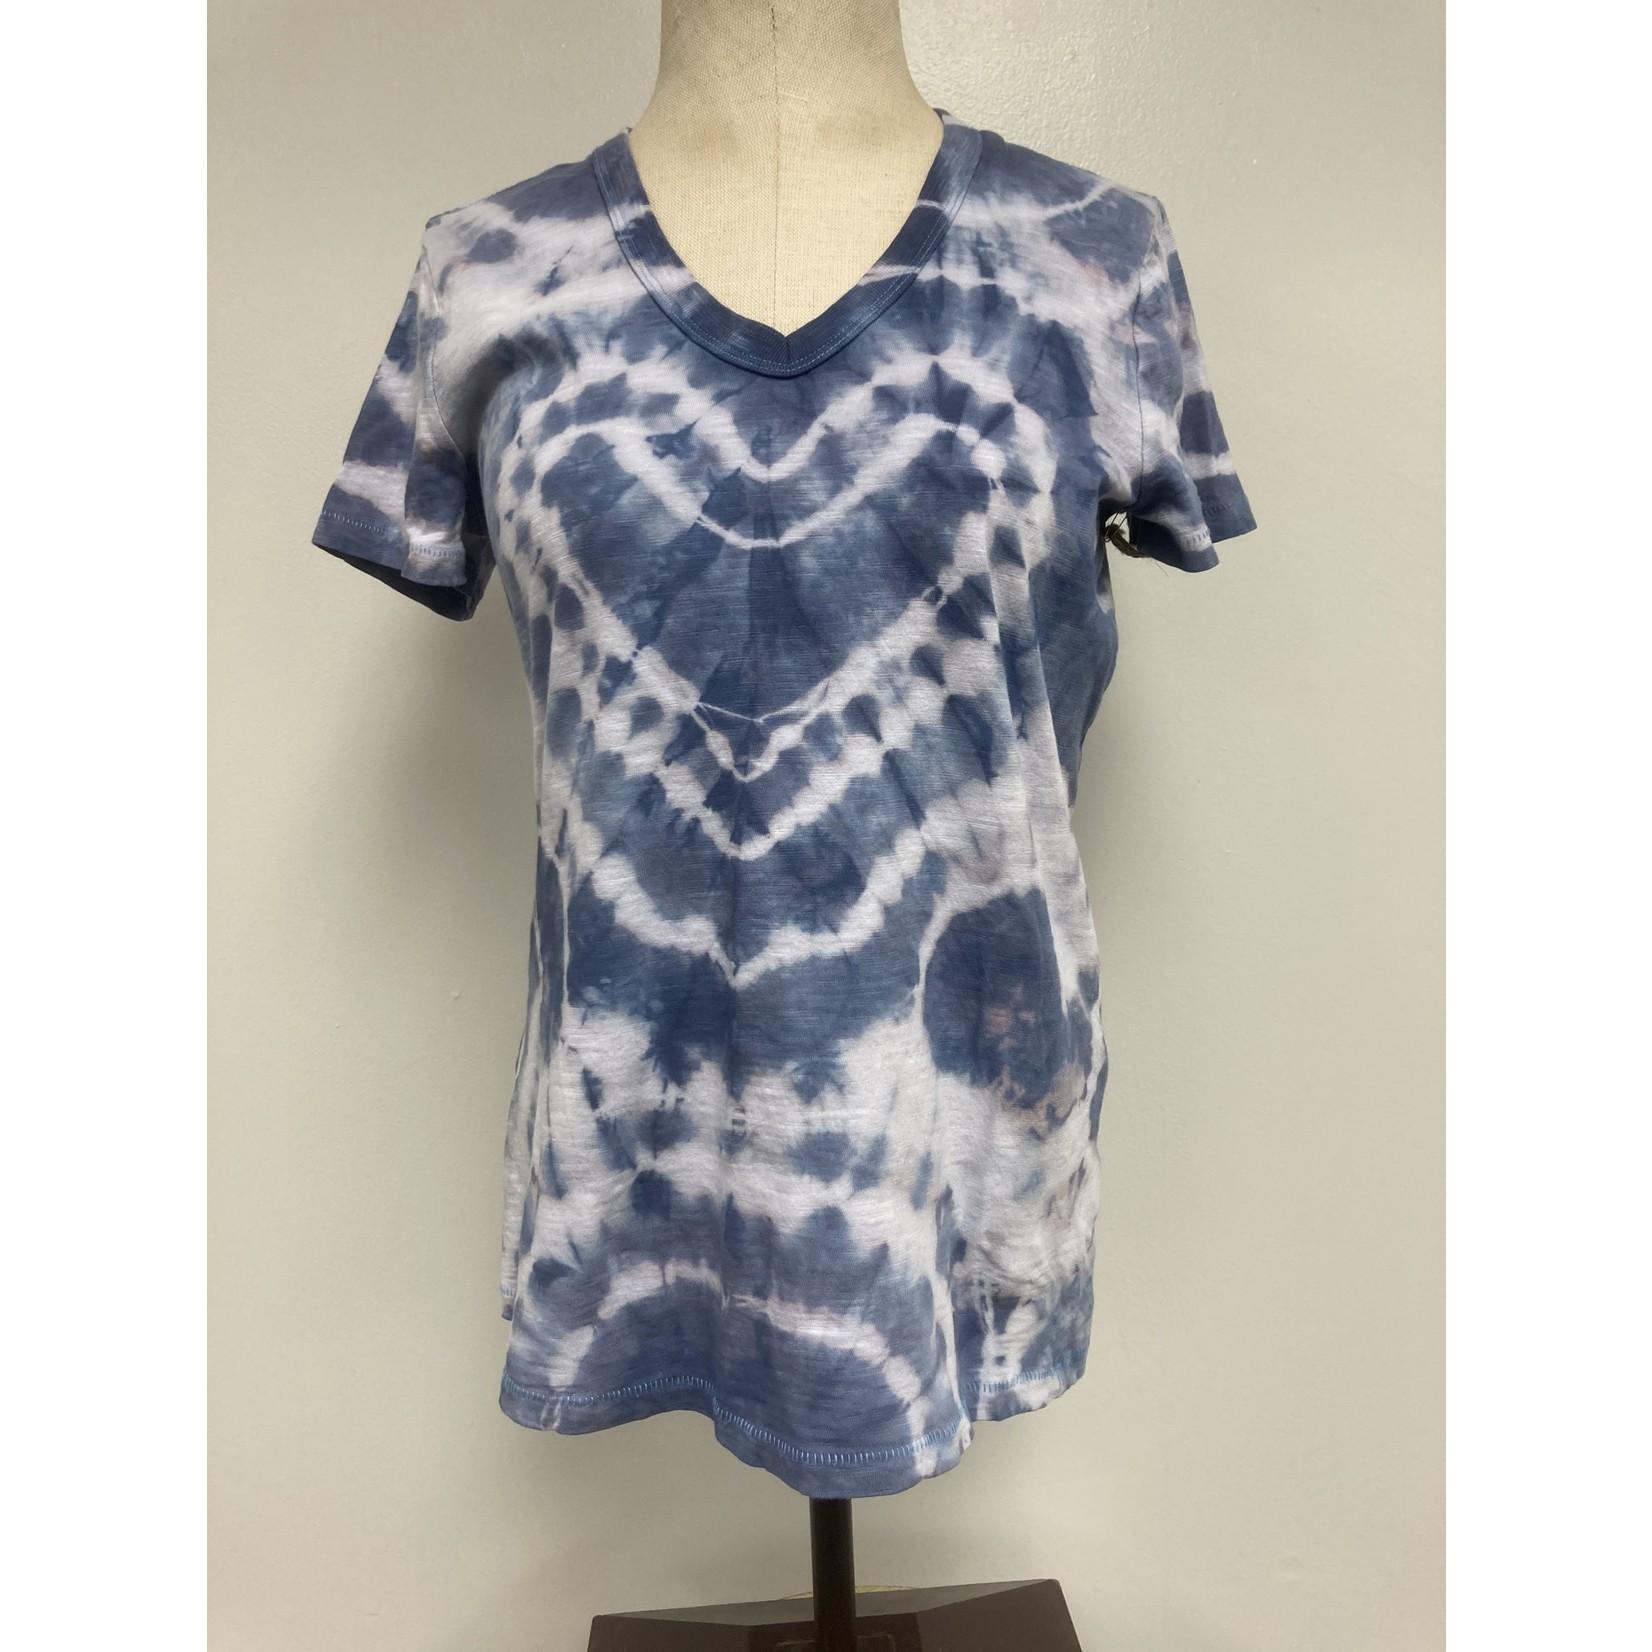 Allie Bonidy Allie B  Blue Heart Tie Dye Tee - XS